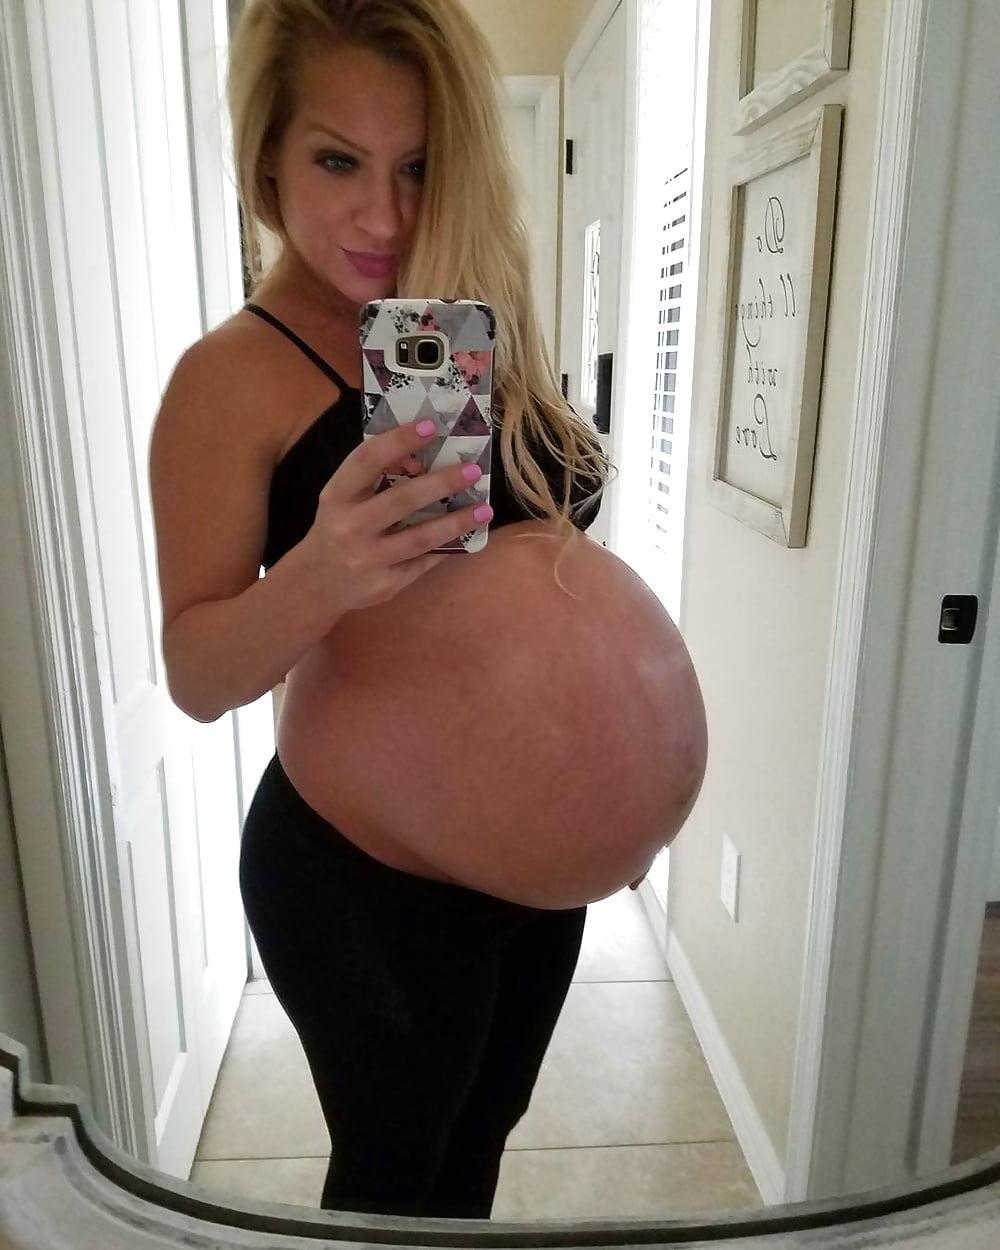 Huge Pregnant Belly And Tits - 8 Pics - Xhamstercom-5417